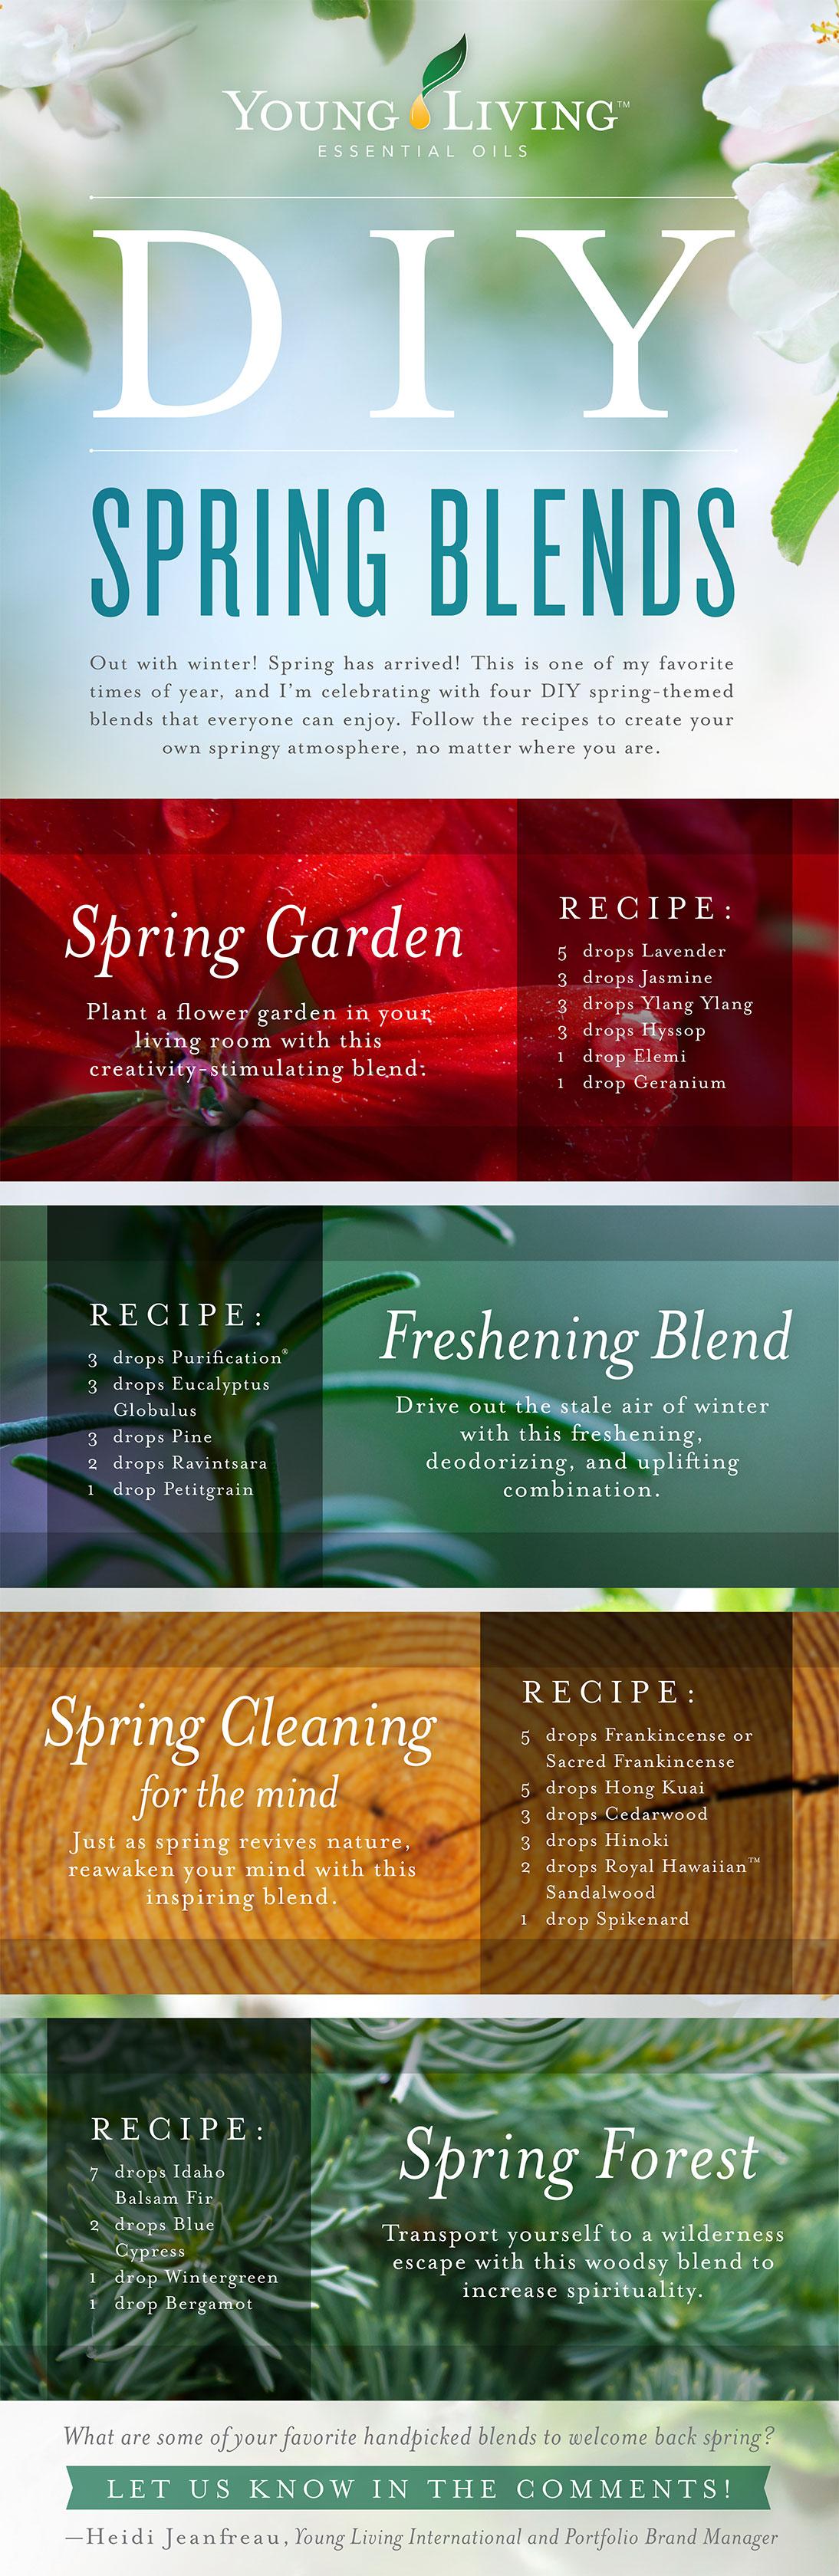 Diy Spring Essential Oil Blend Recipes Young Living Essential Oils